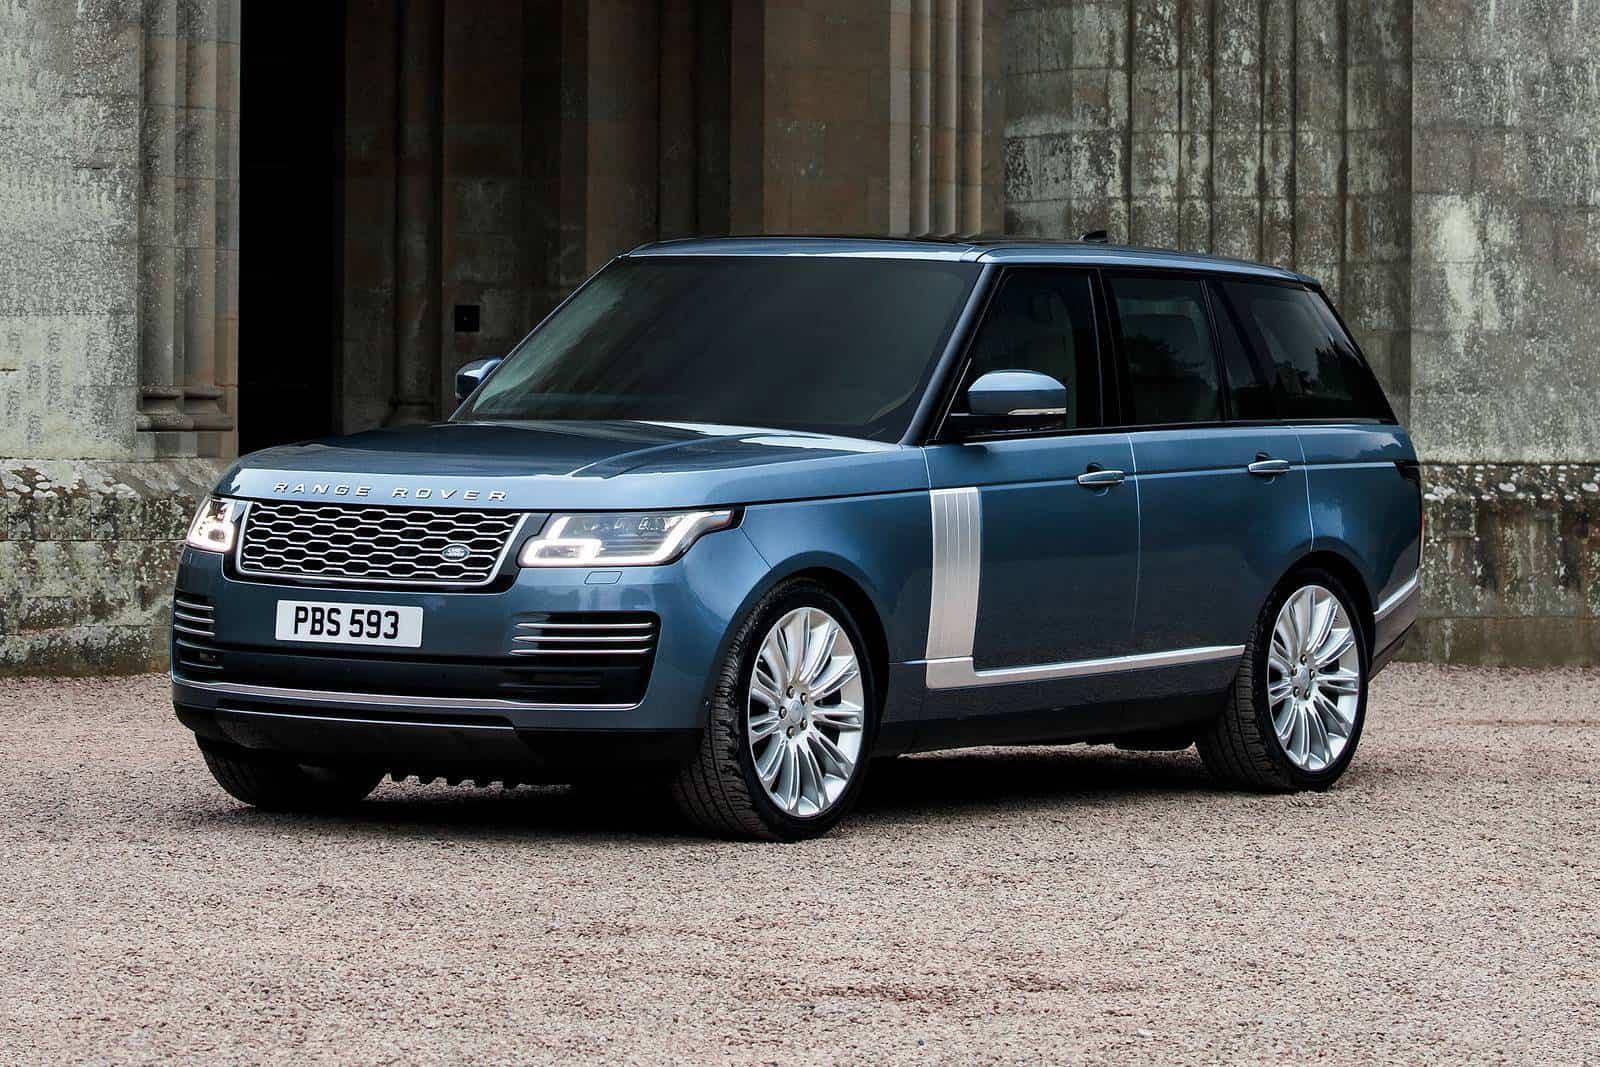 2021 Range Rover SVAutobiography